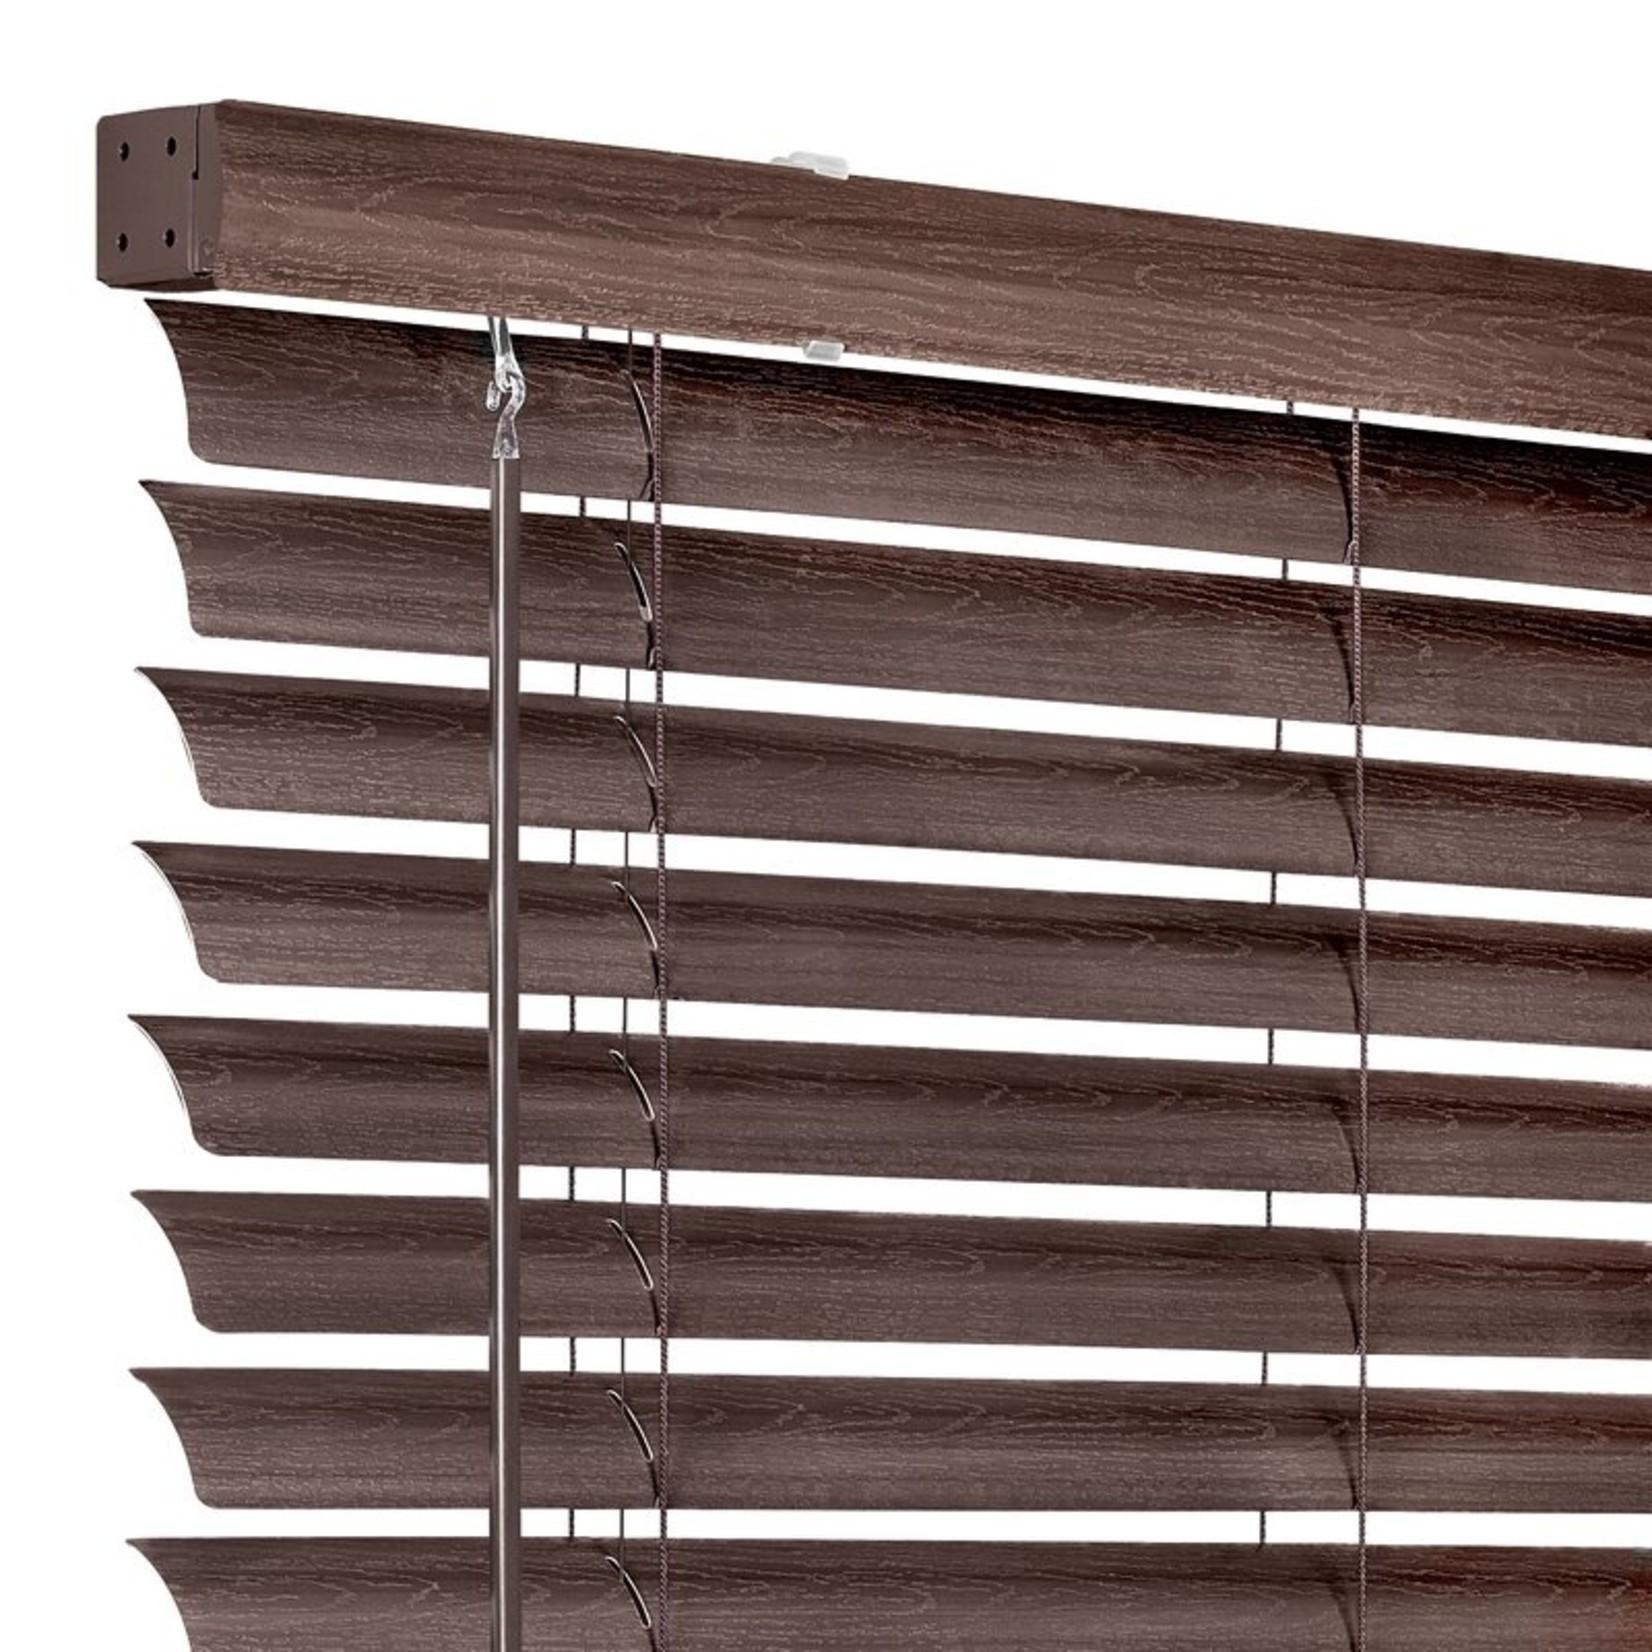 "*GII Luna Cordless Vinyl Semi-Sheer Horizontal/Venetian Blind - 27"" x 64"" - Mahogany - Final Sale"